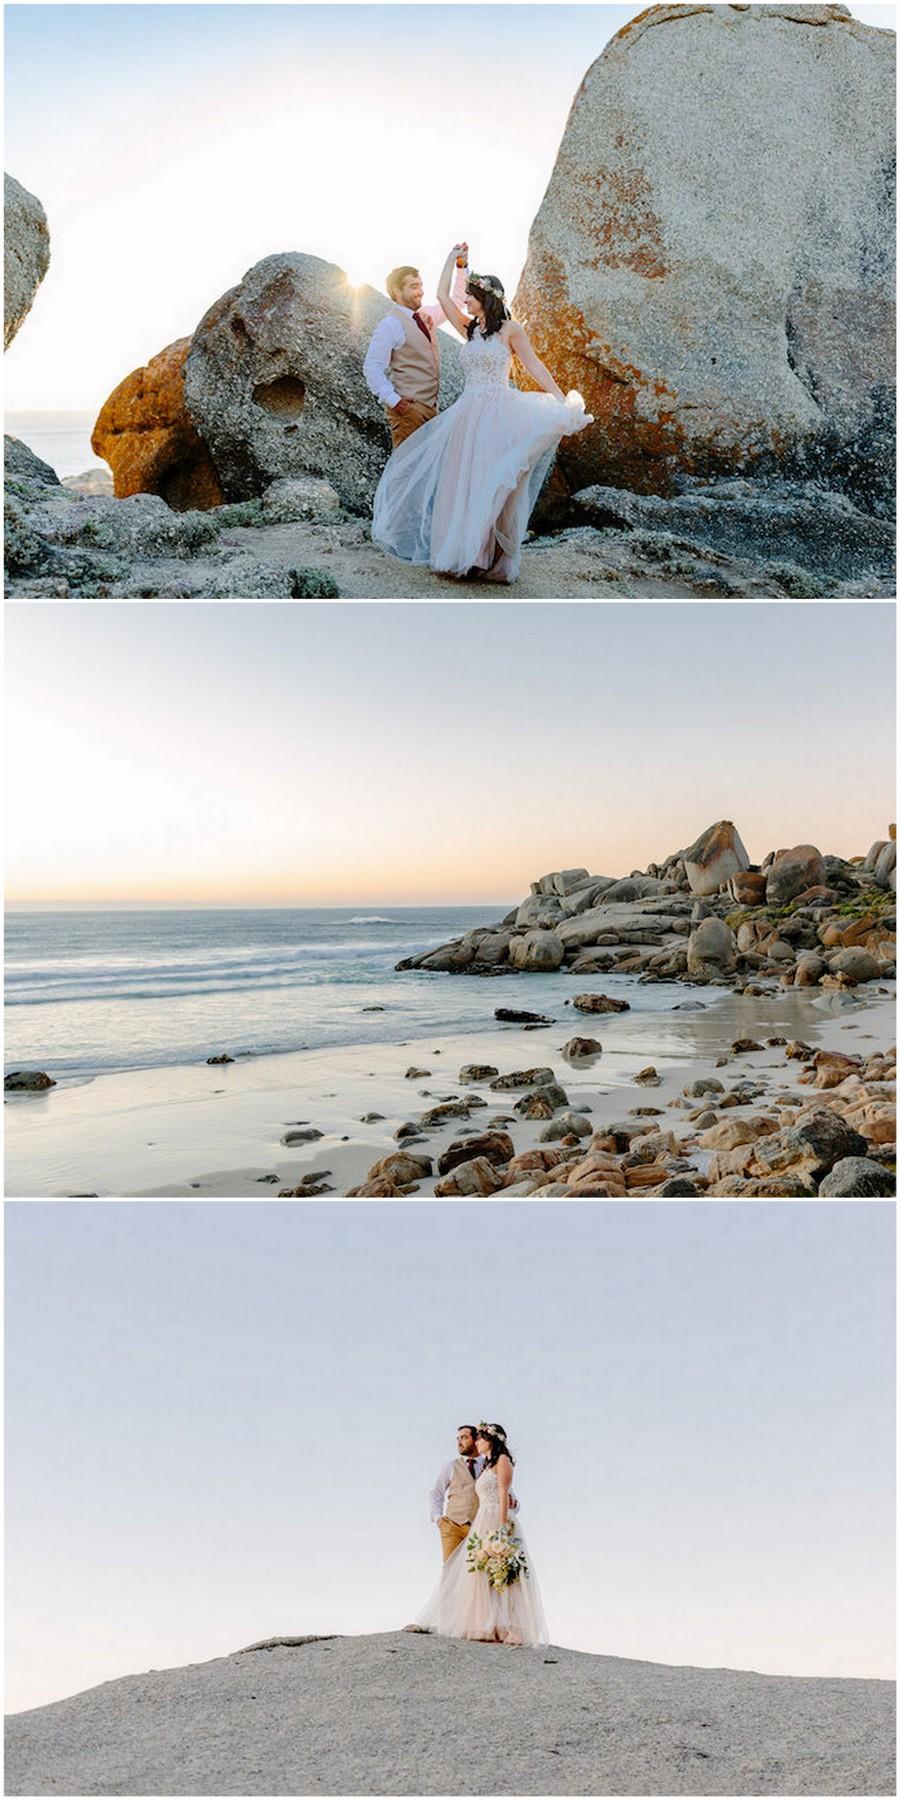 Llandudno Beach Couple Photograph Ideas